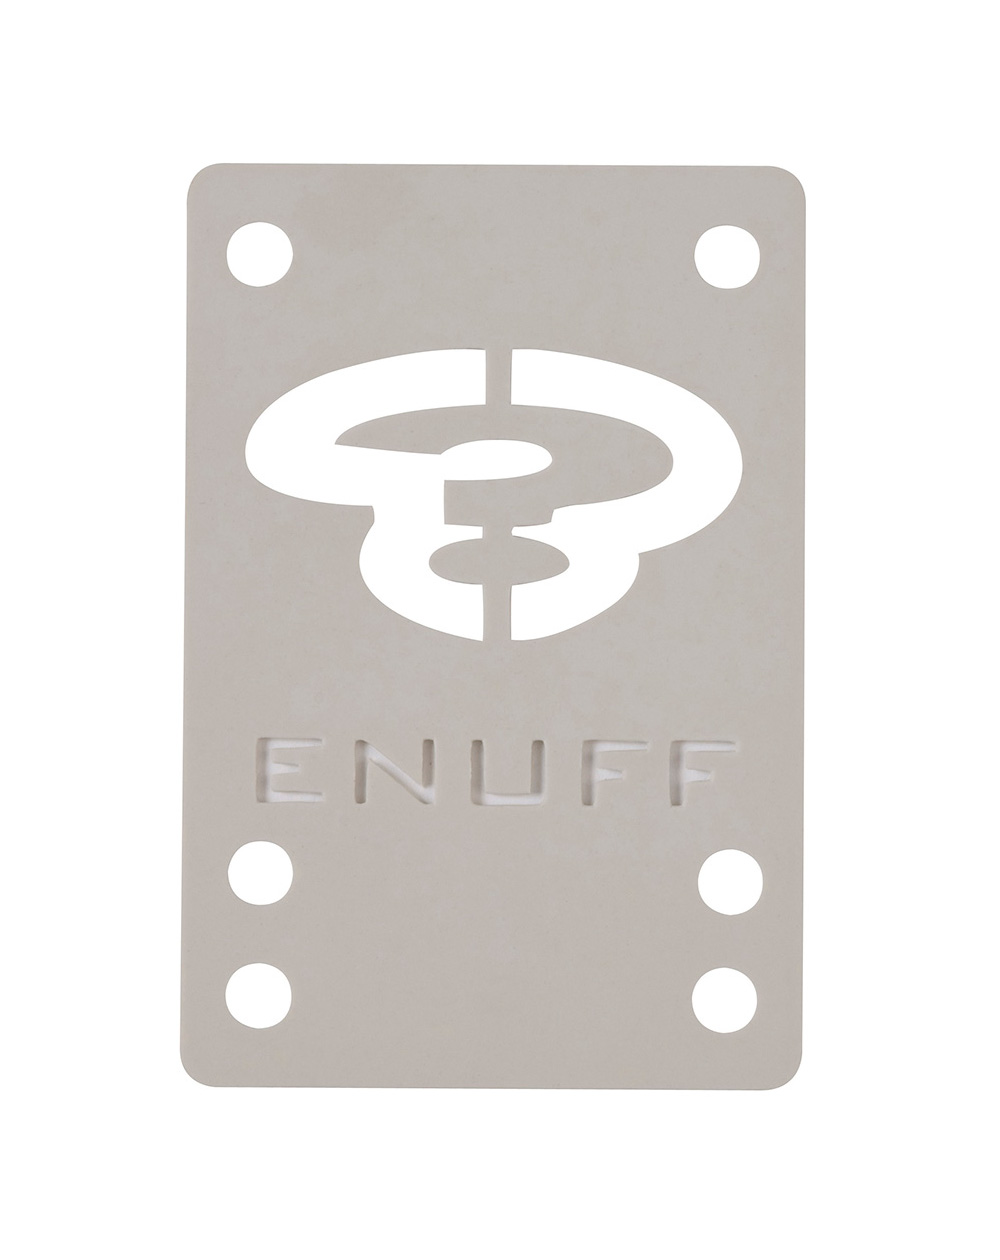 Enuff Riser Shock 1mm White 2 pz